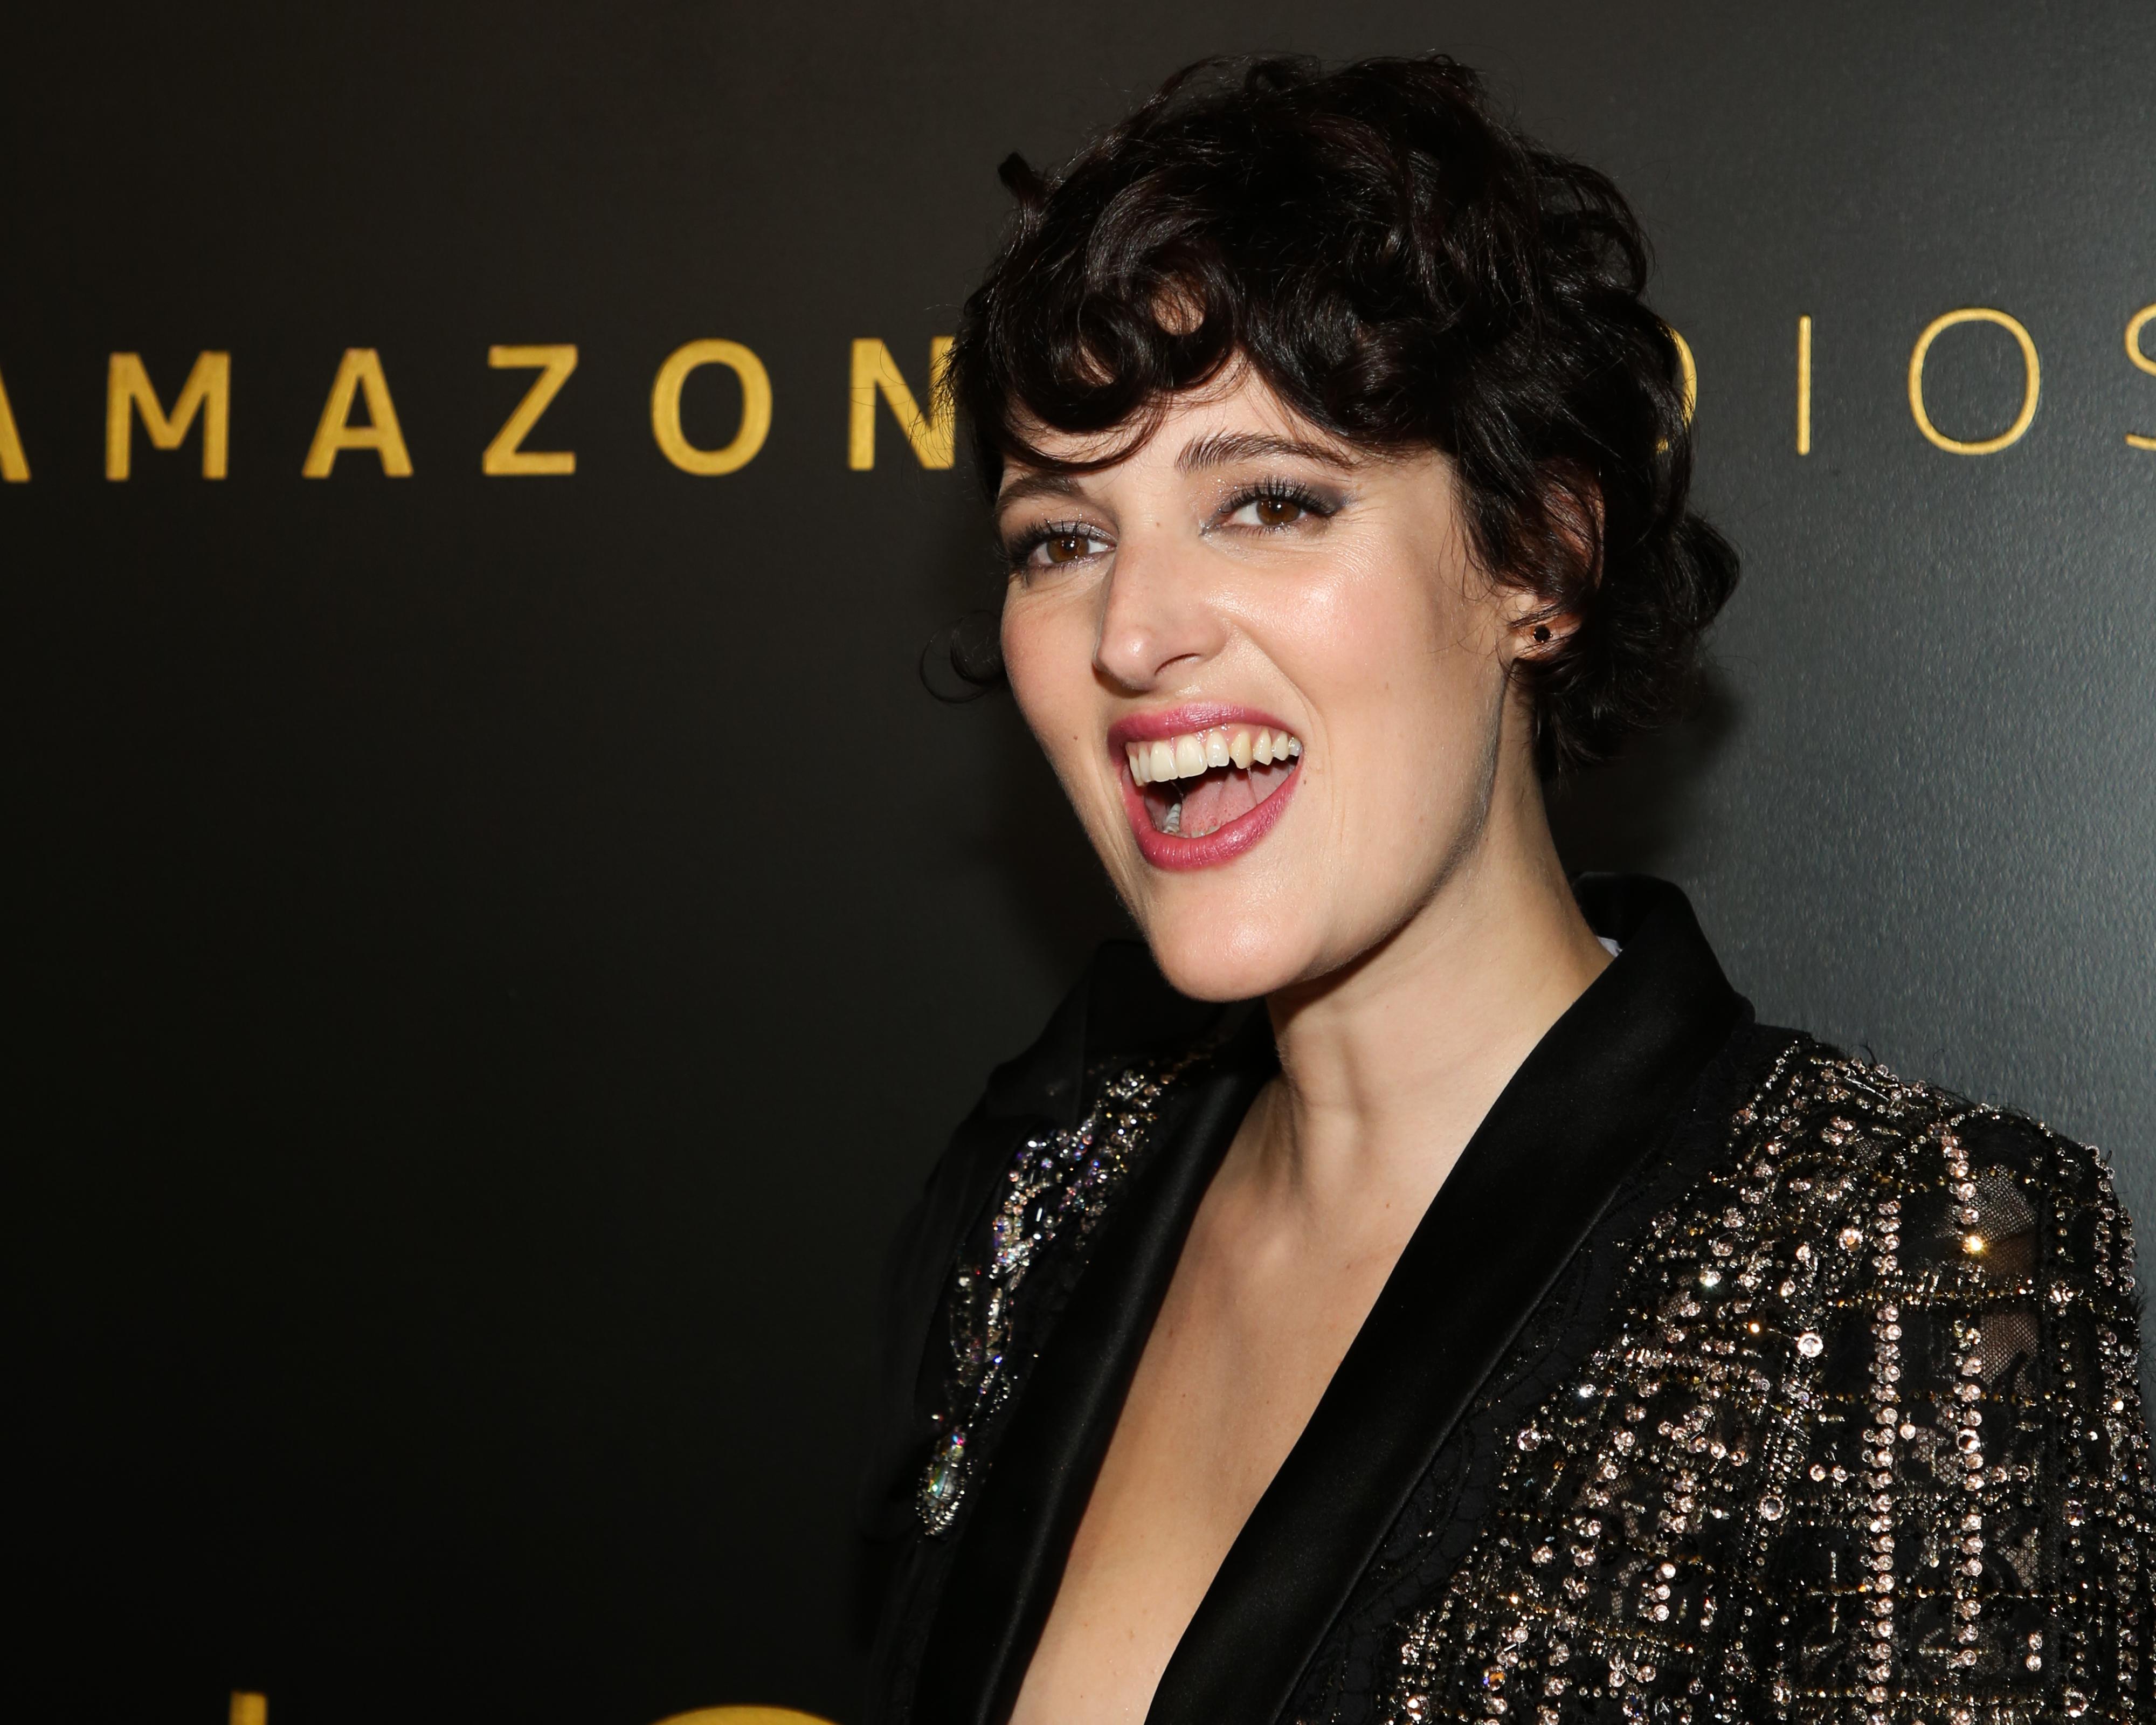 Amazon Studios Golden Globes After Party - Arrivals